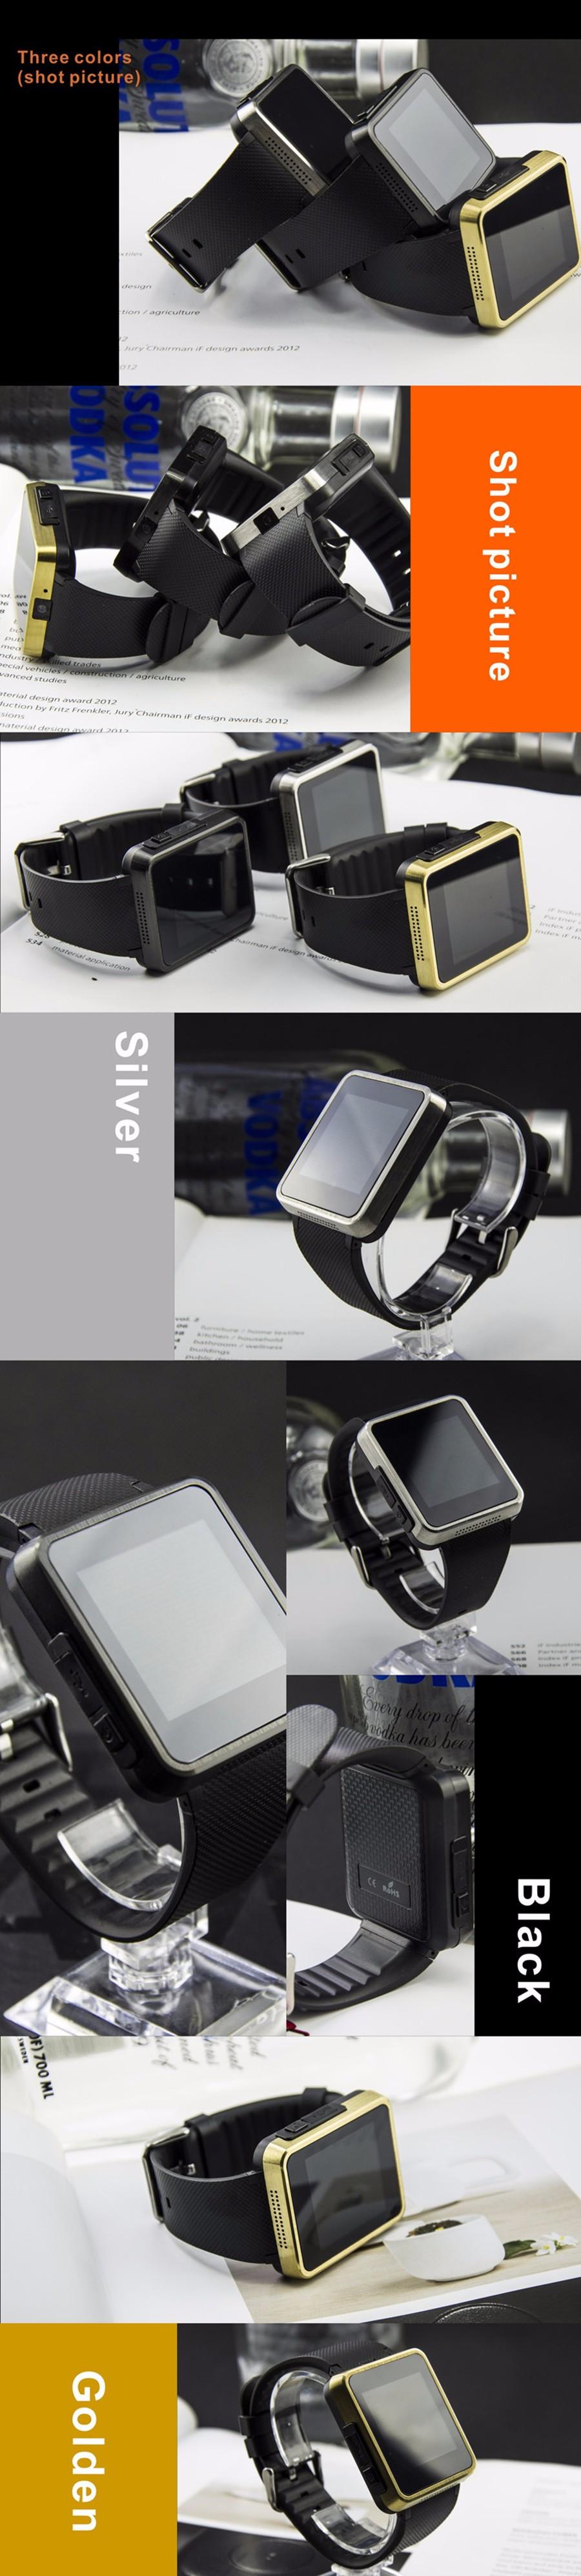 7 watch